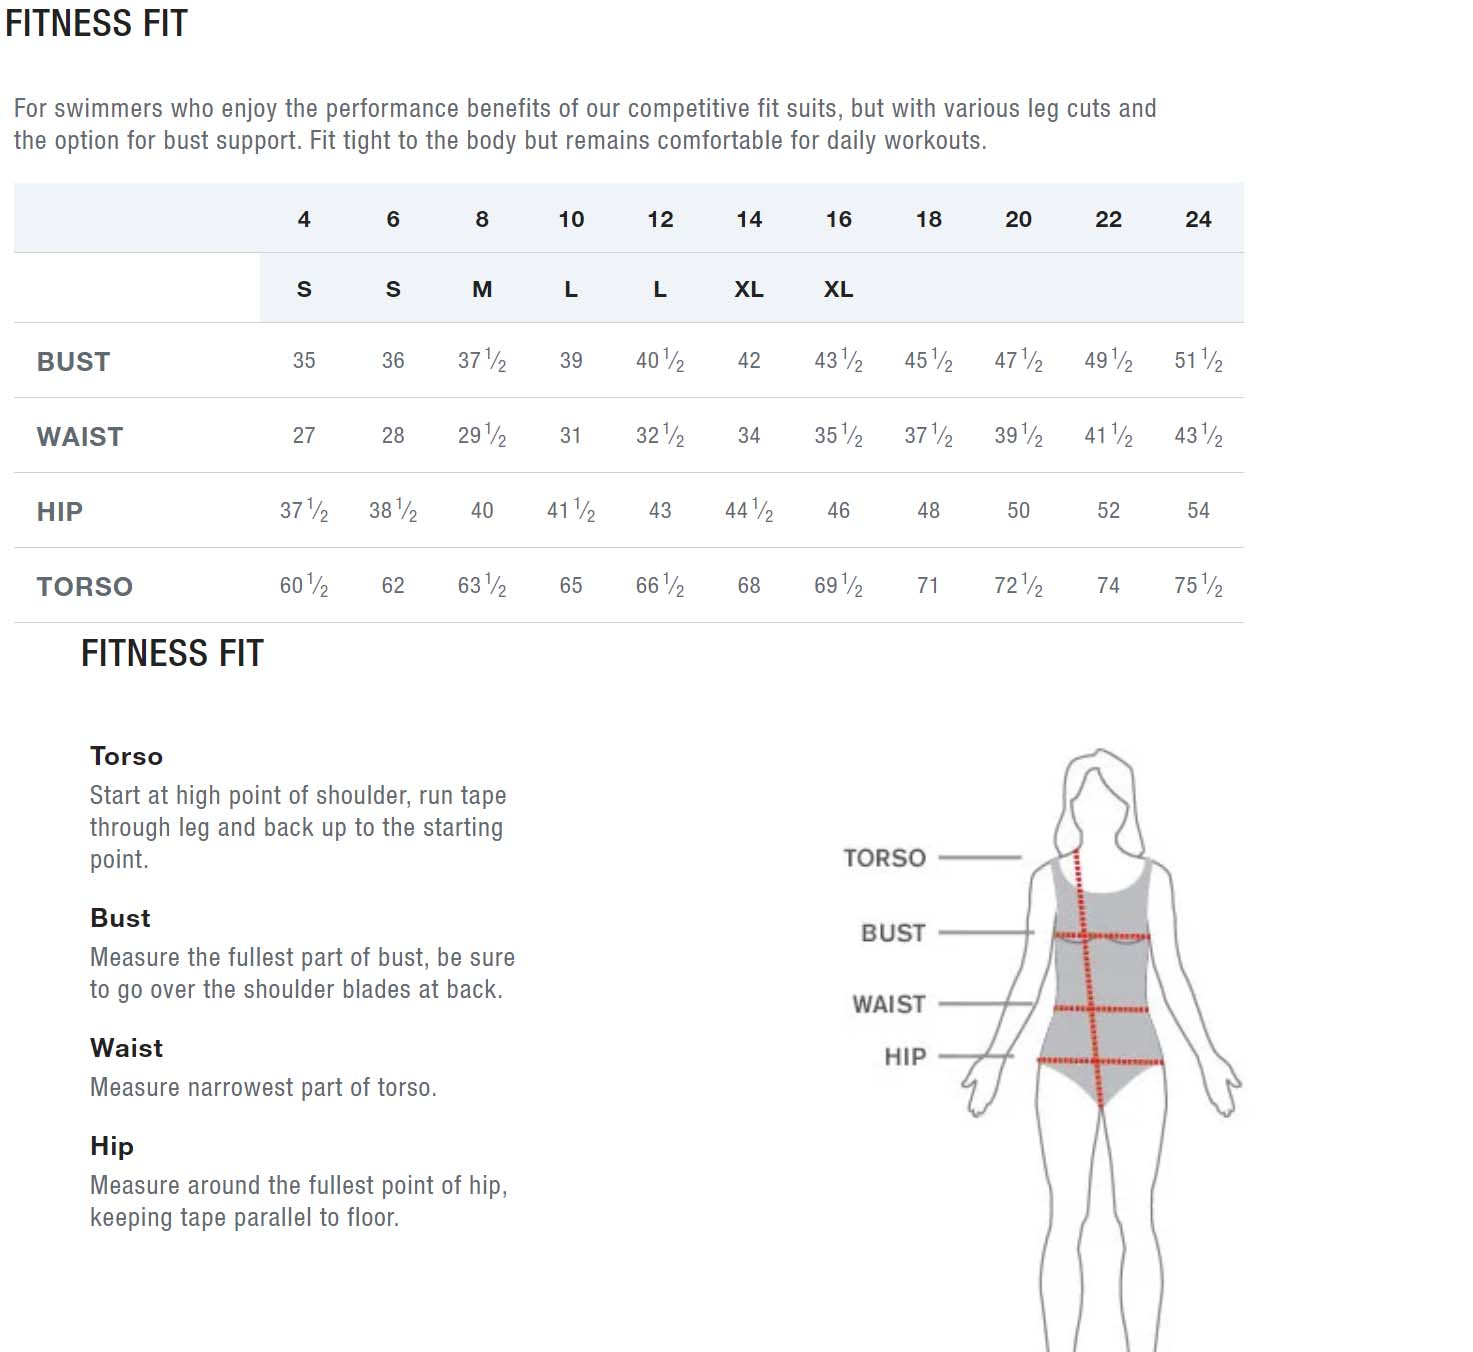 speedo-fitness-size-chart-20.jpg